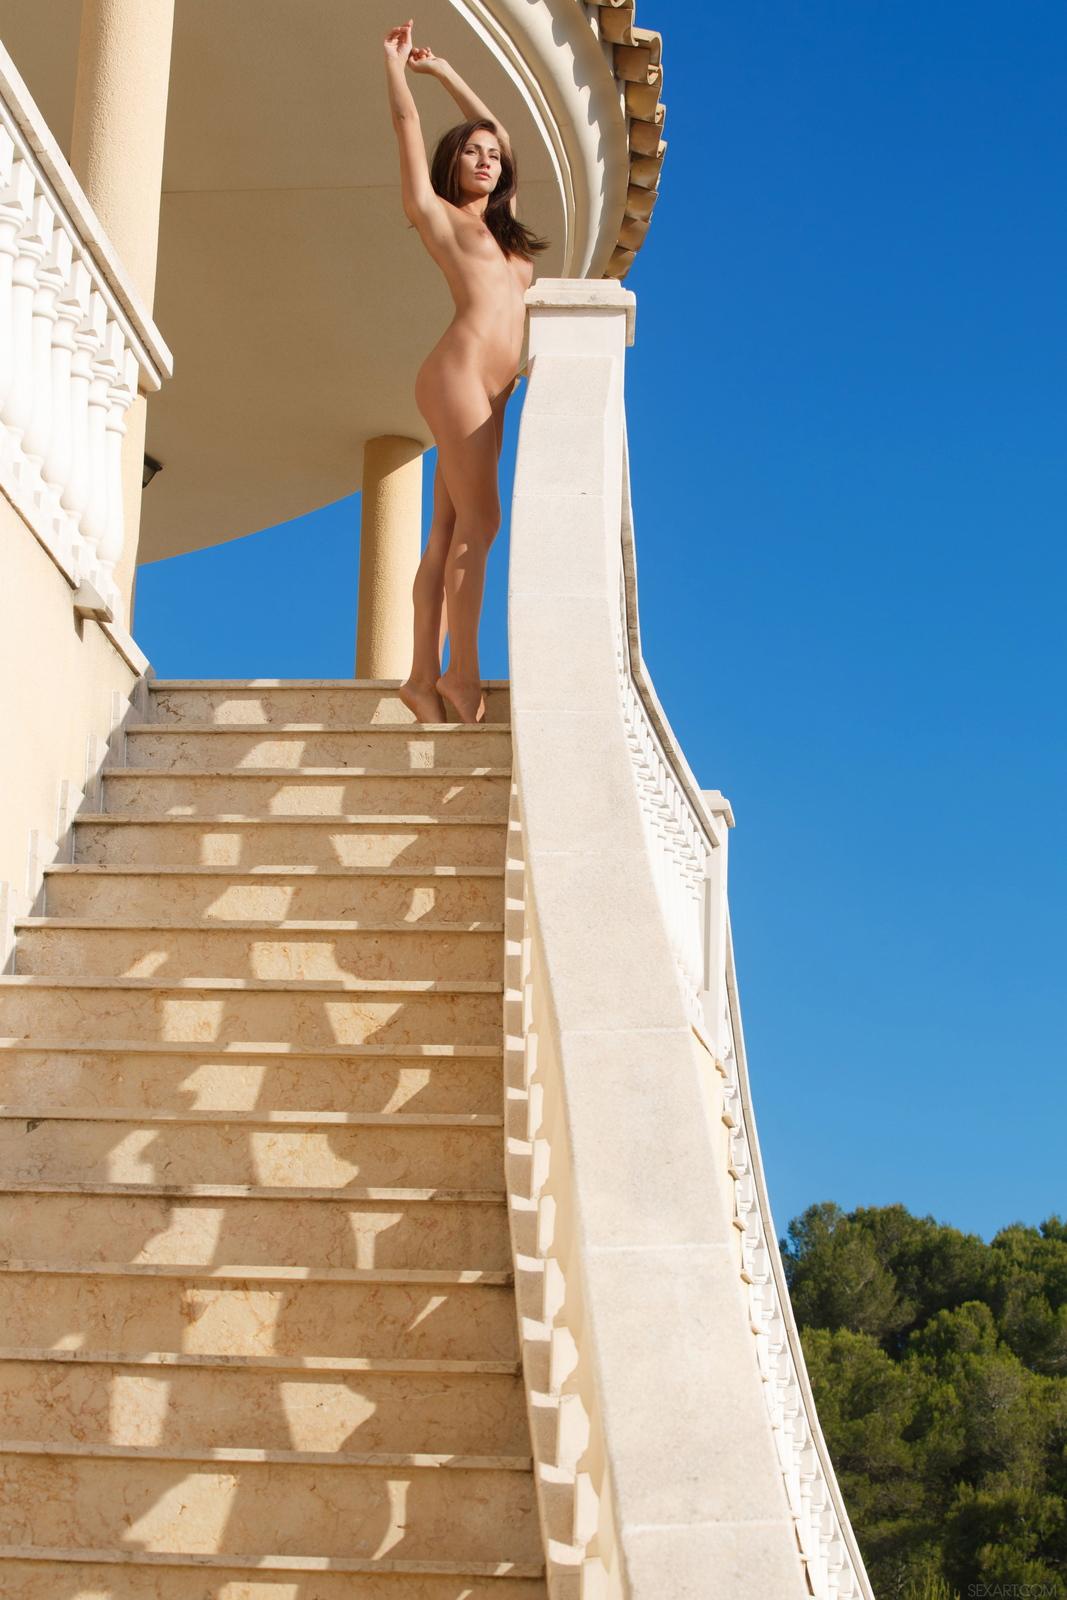 michaela-isizzu-stairs-high-heels-naked-sexart-45